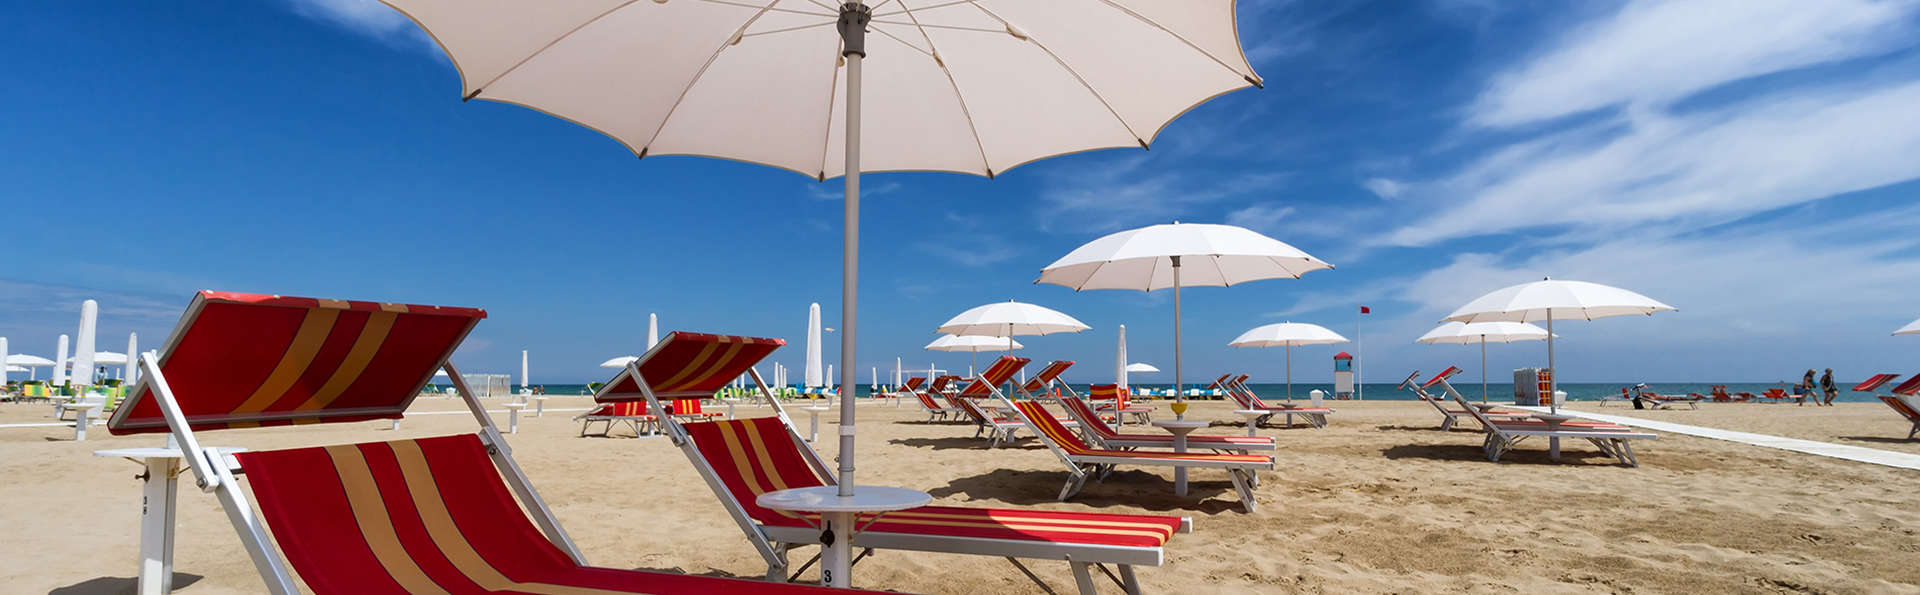 Hotel Ambasciatori - Edit_Destination.jpg